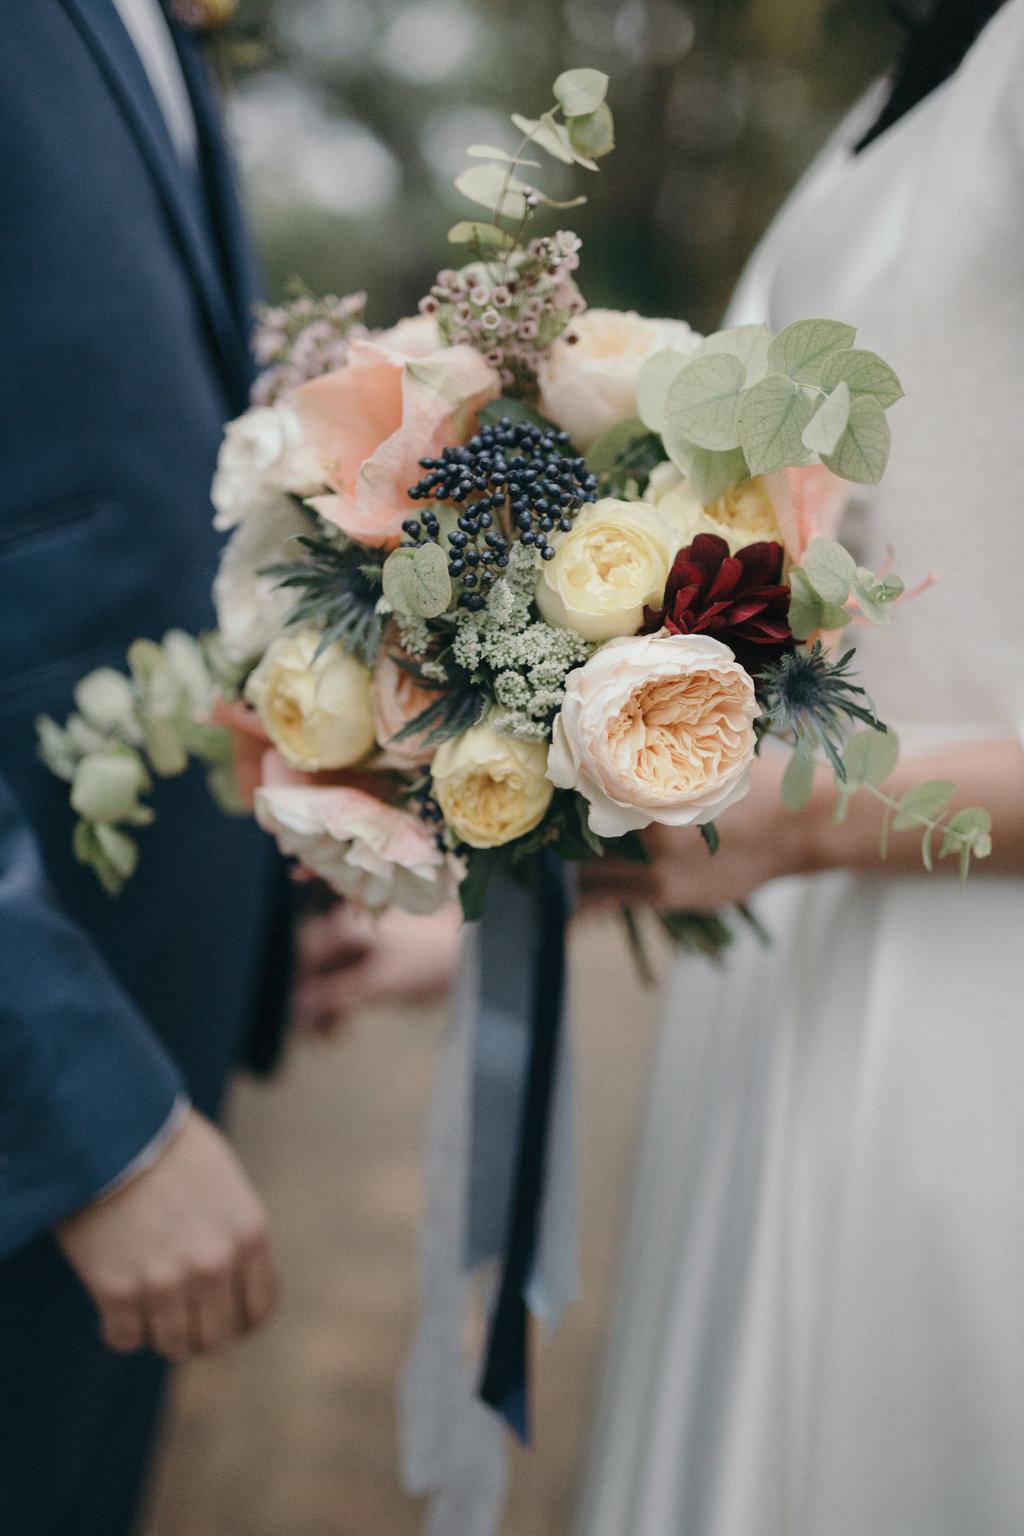 sebastienboudot-wedding-photographer-nadia-eric-369